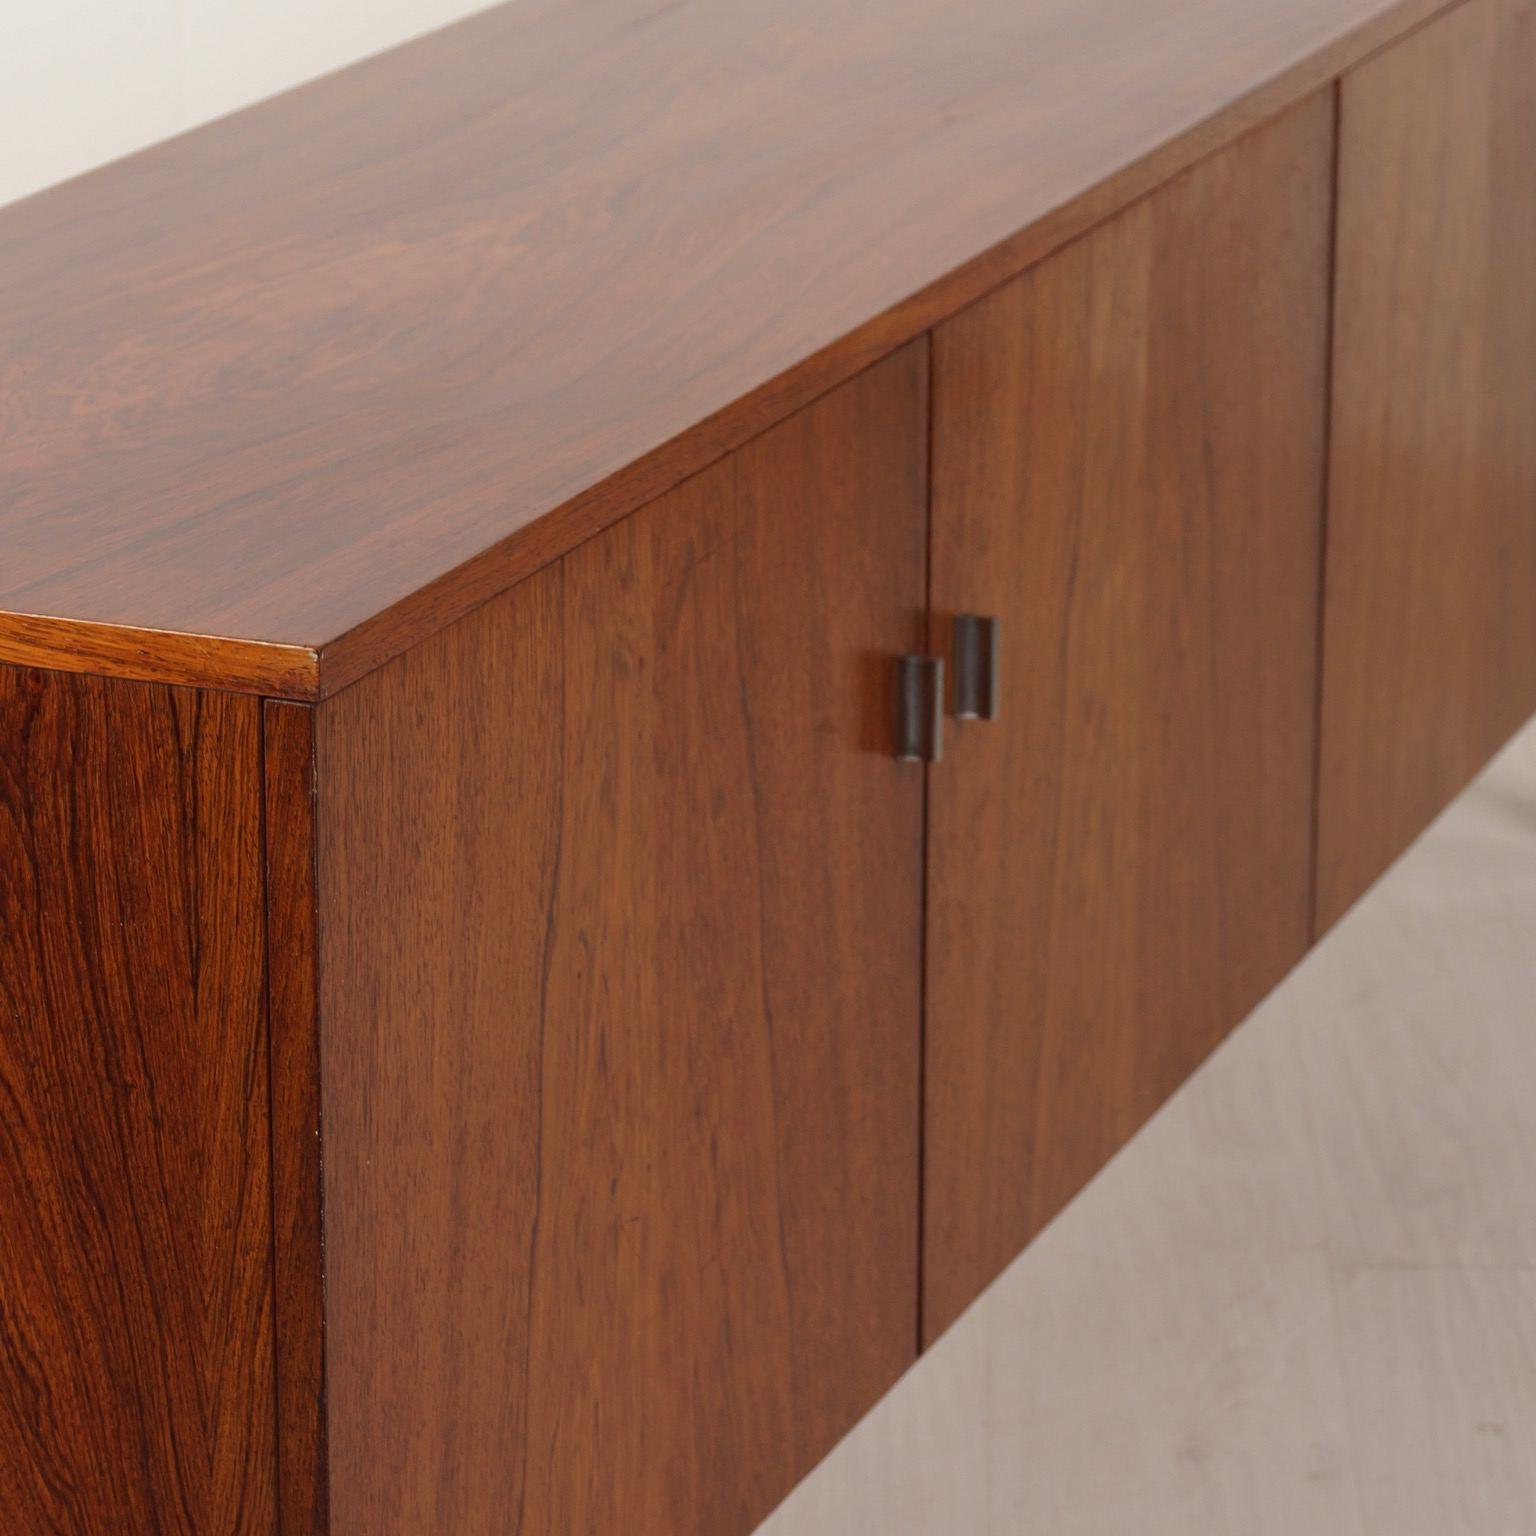 Vintage Brown Textured Sideboards Inside Popular Vintage Sideboard Made Of Rosewood, 1960s – Ztijl Design (View 15 of 20)